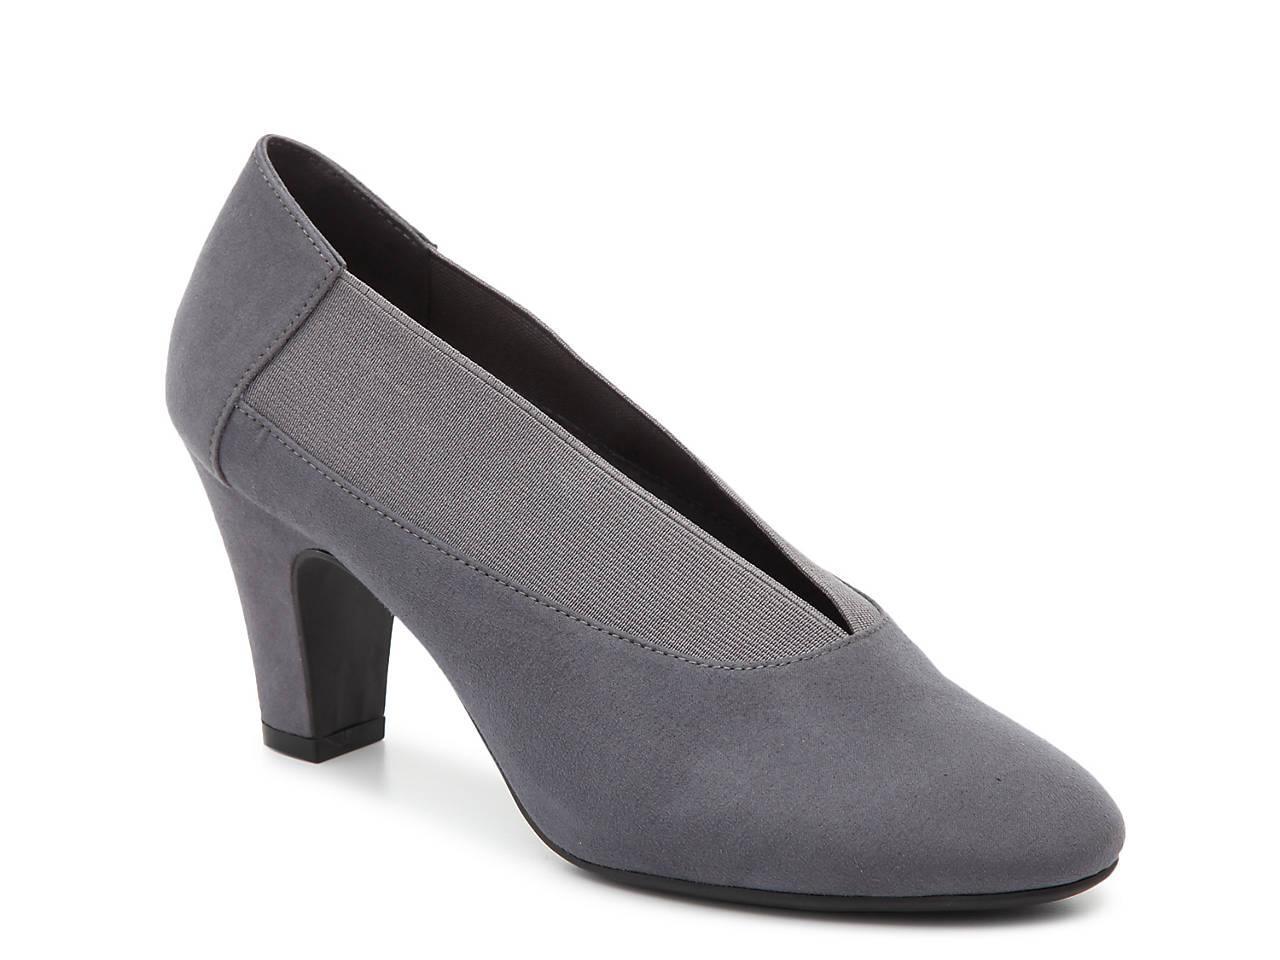 55c2637f5641 Abella Merrone Pump Women s Shoes